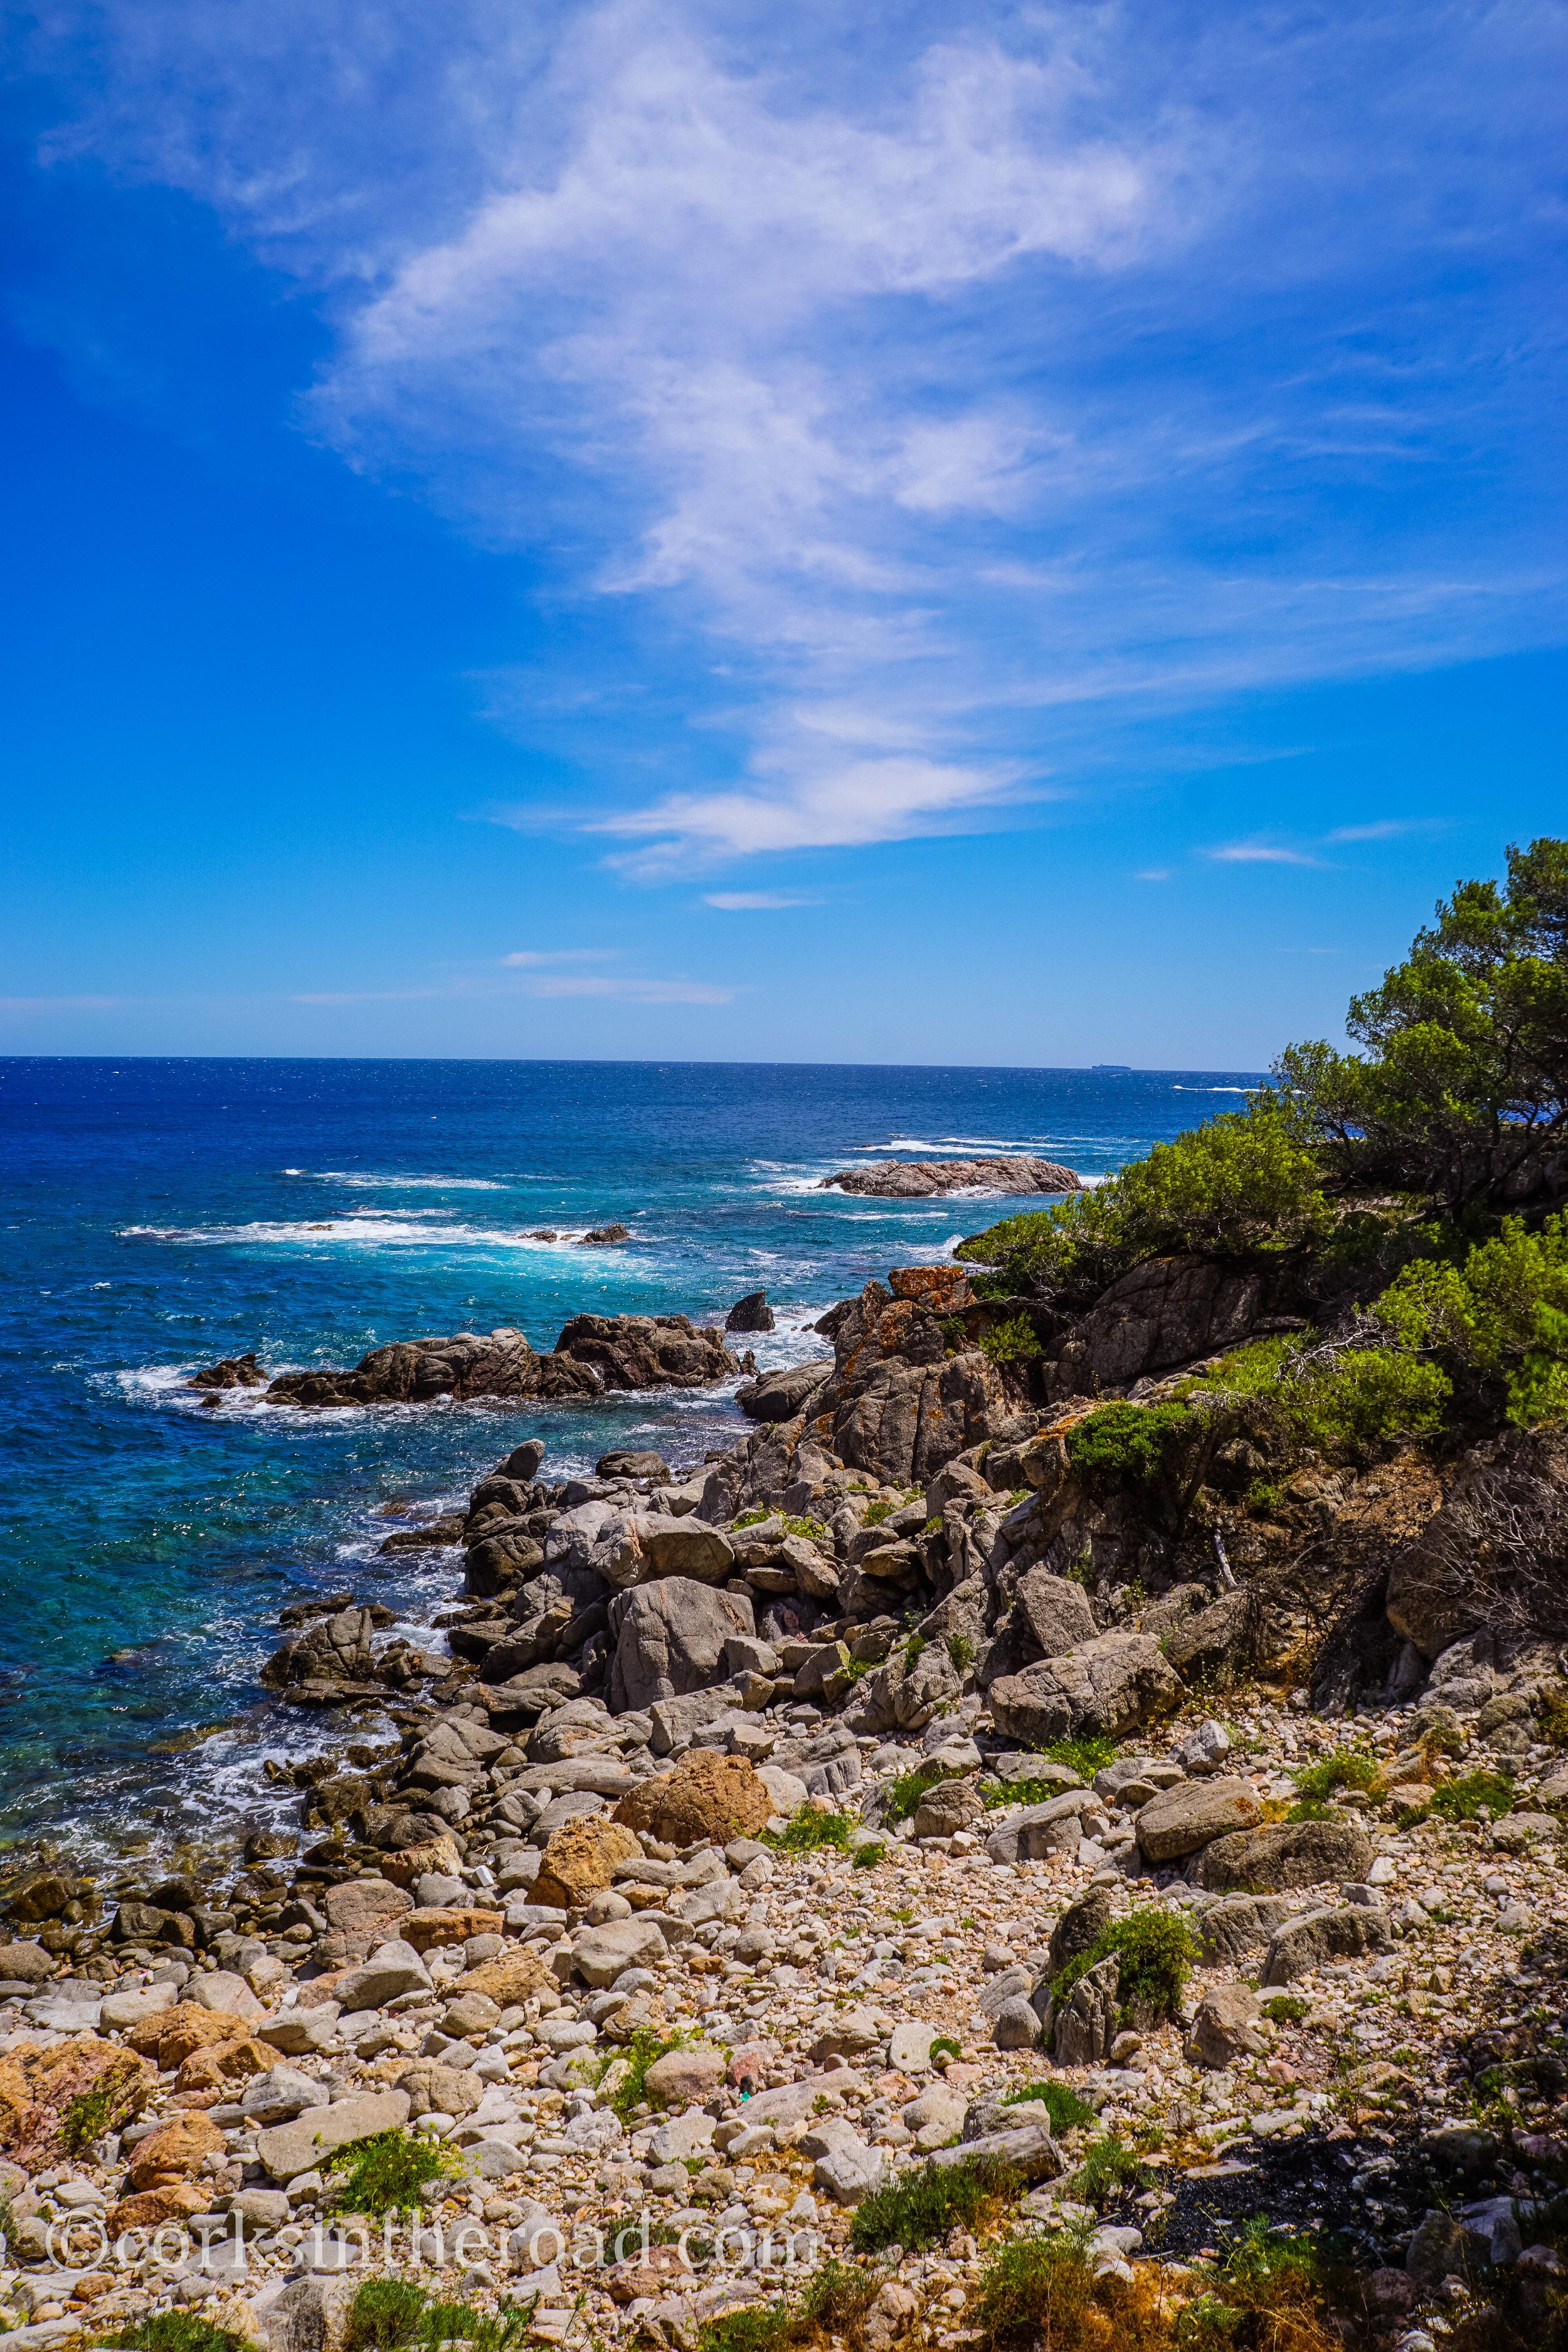 20160810Barcelona, Corksintheroad, Costa Brava, Costa Brava Landscape-42.jpg